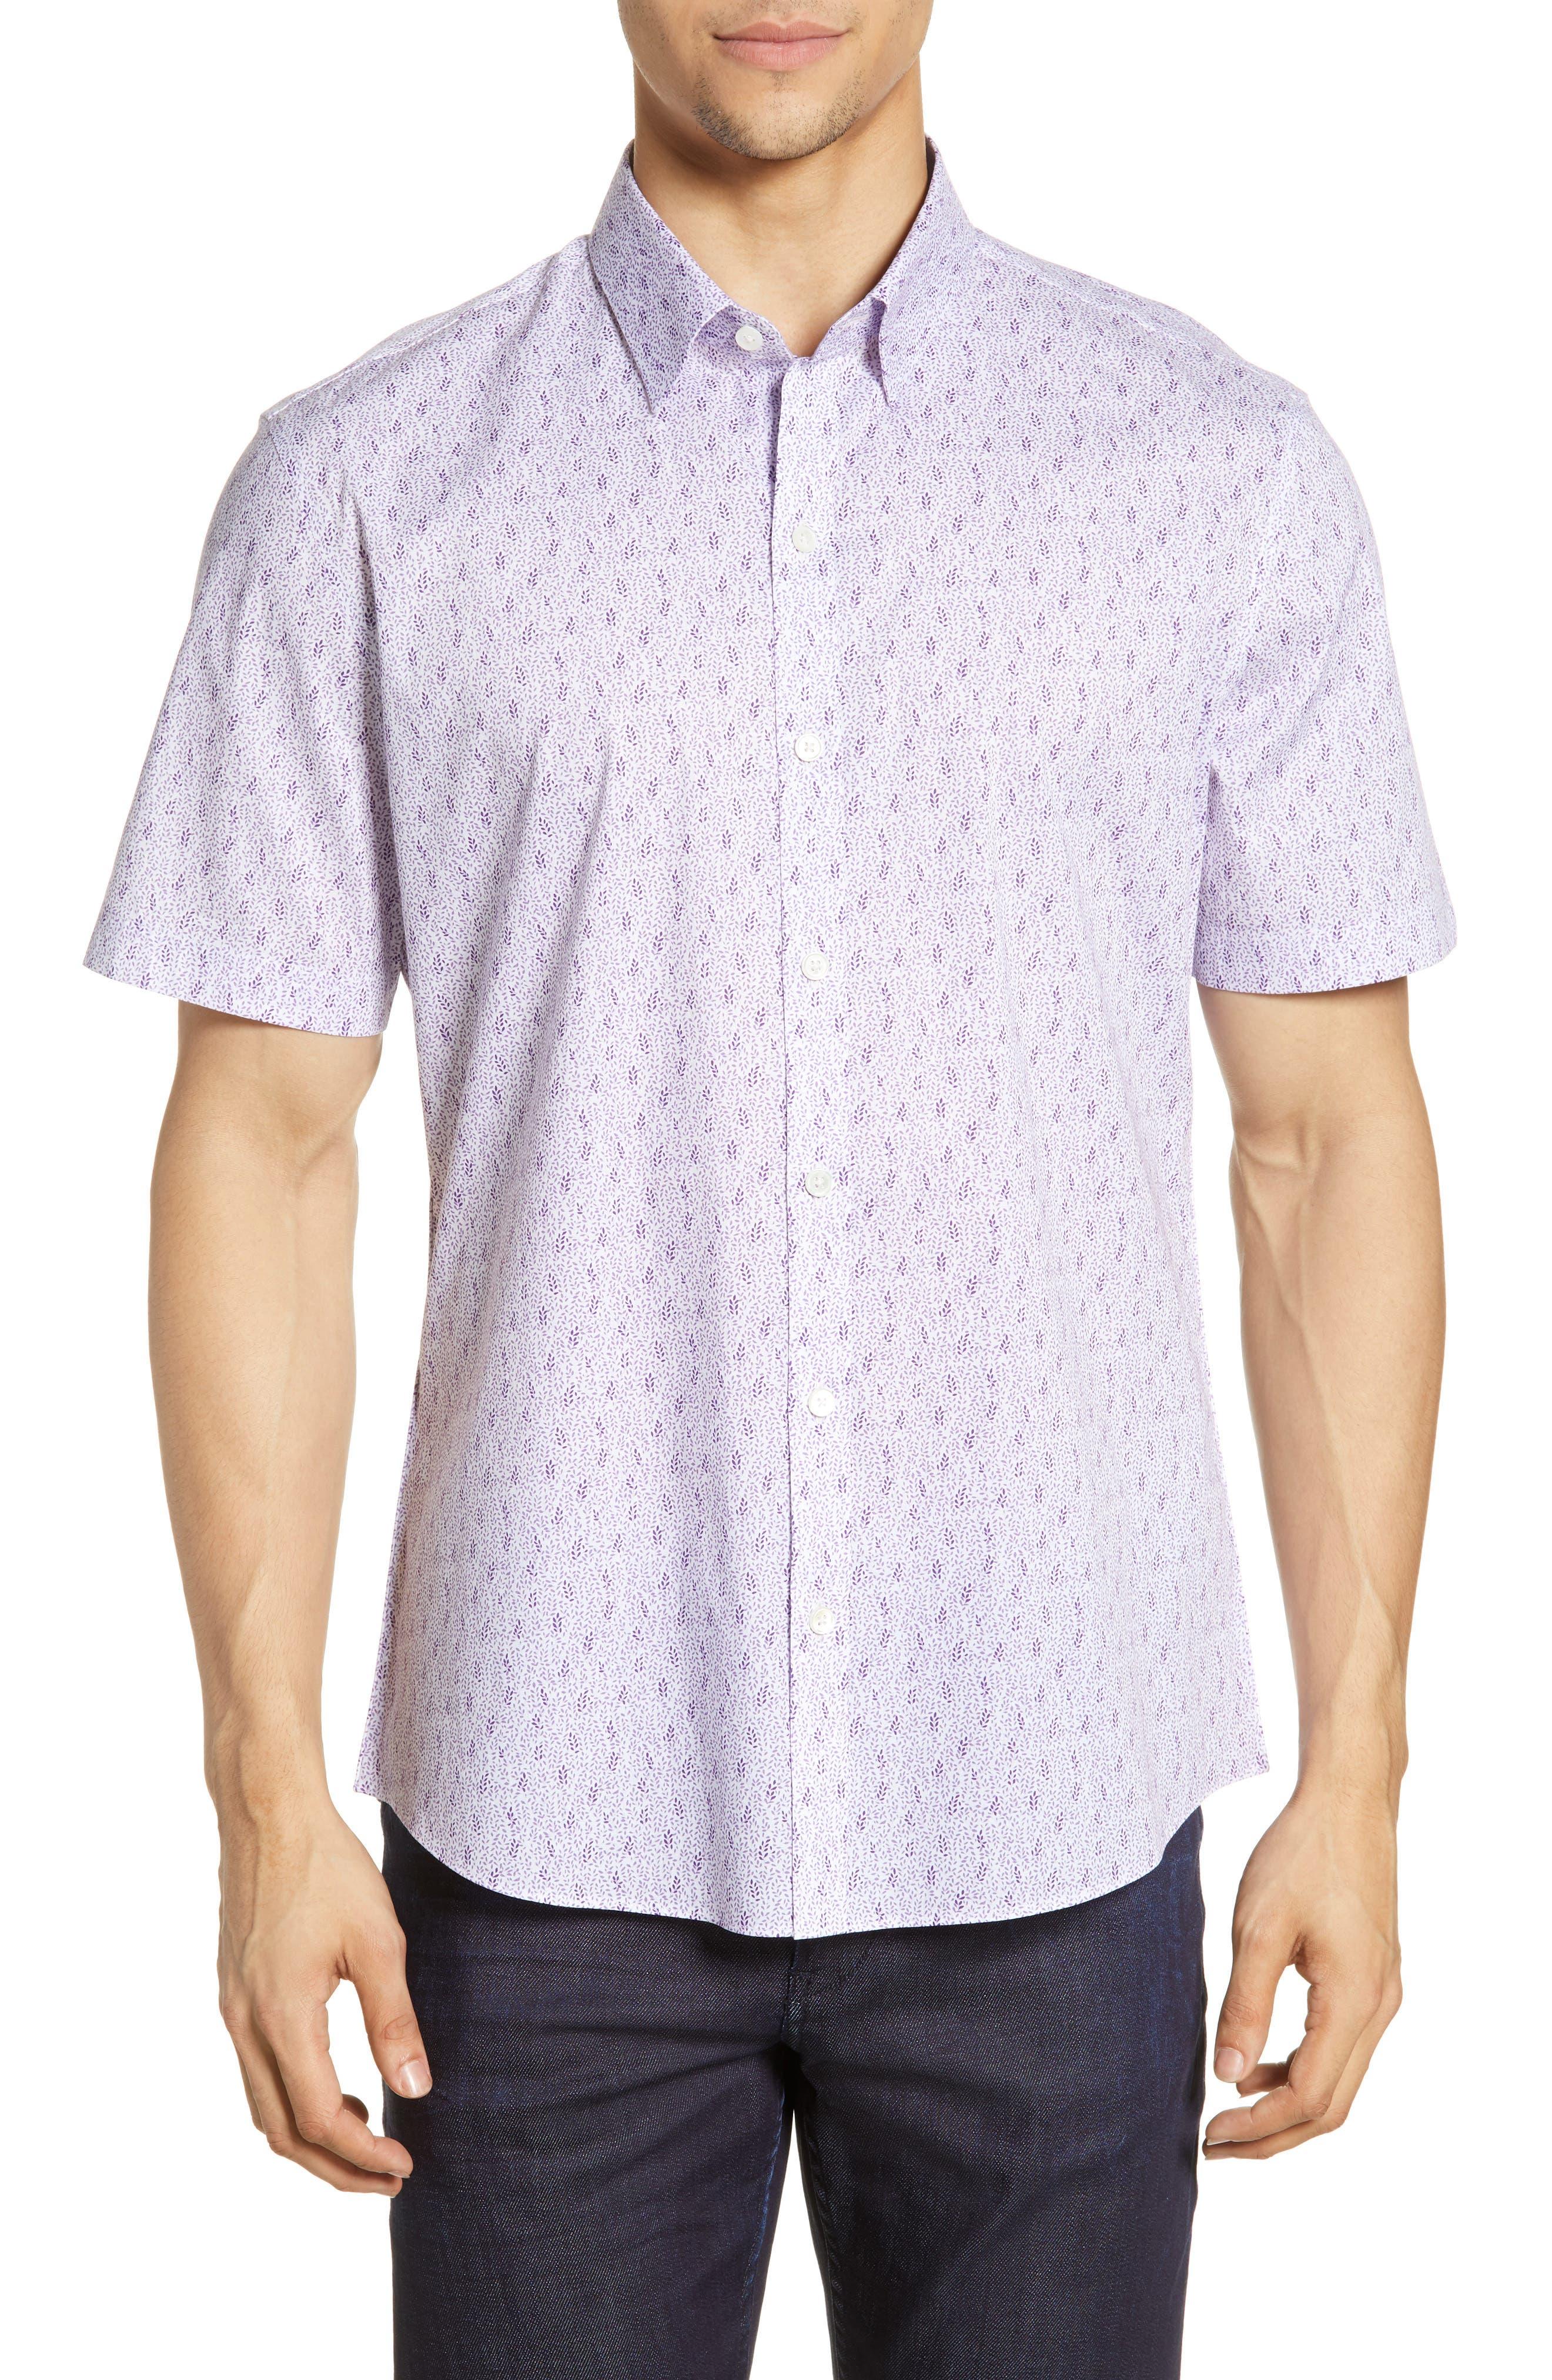 Image of Zachary Prell Twaits Regular Fit Print Shirt